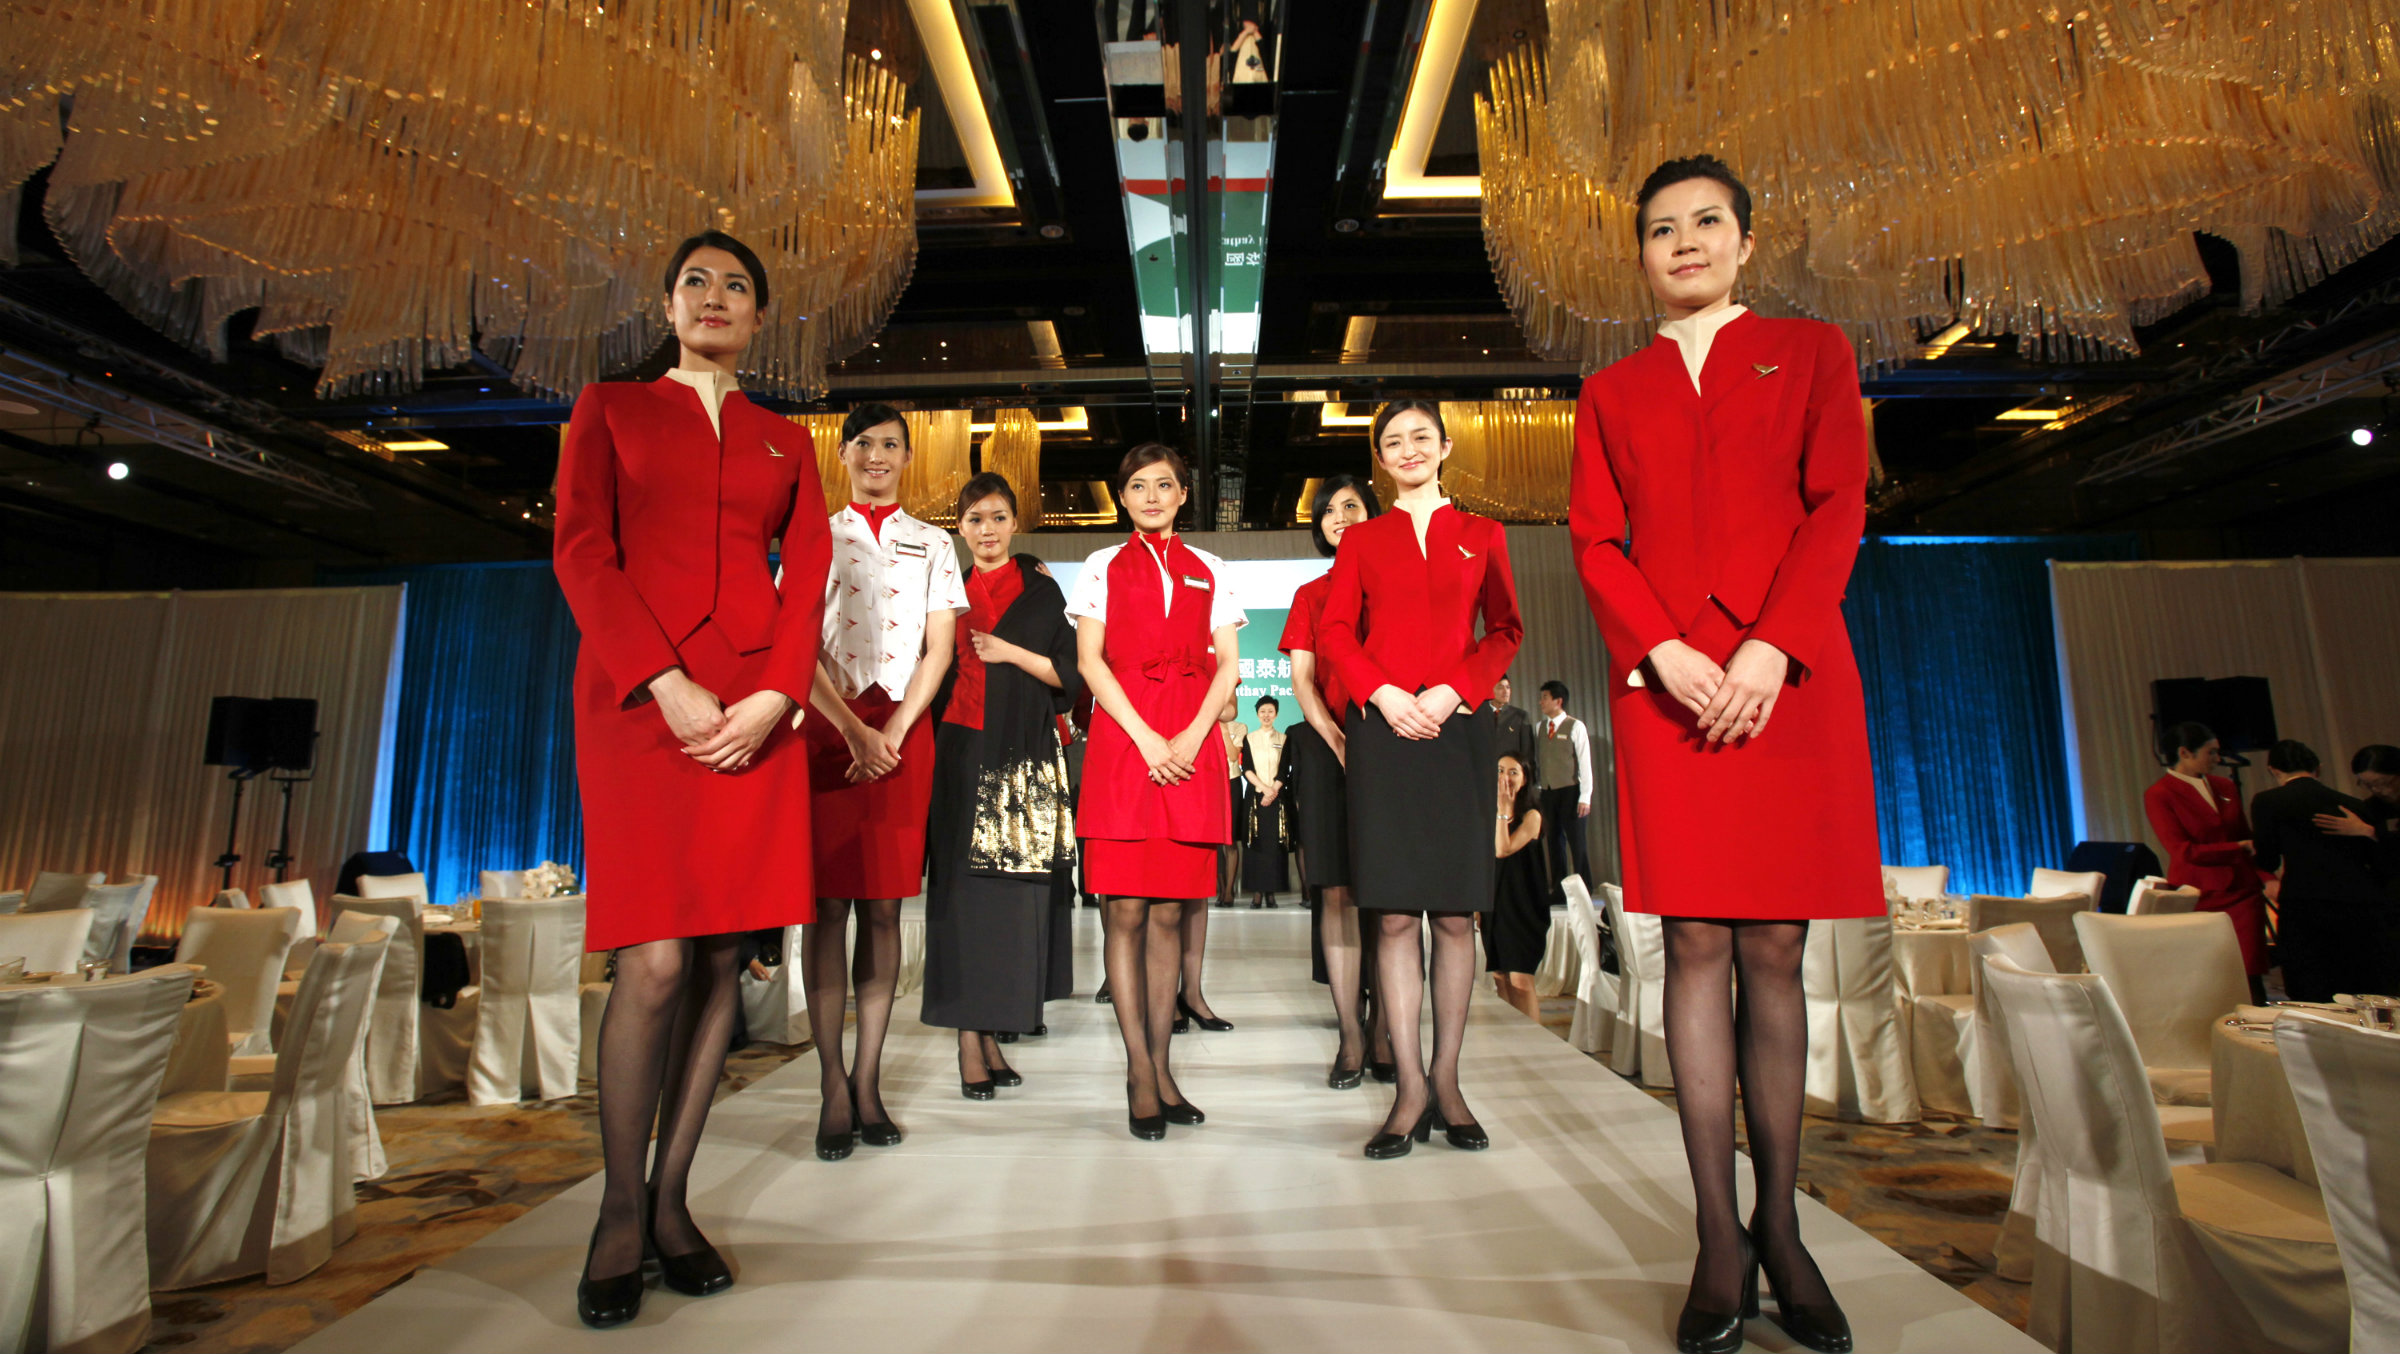 Eurowings stewardess sexual harassment